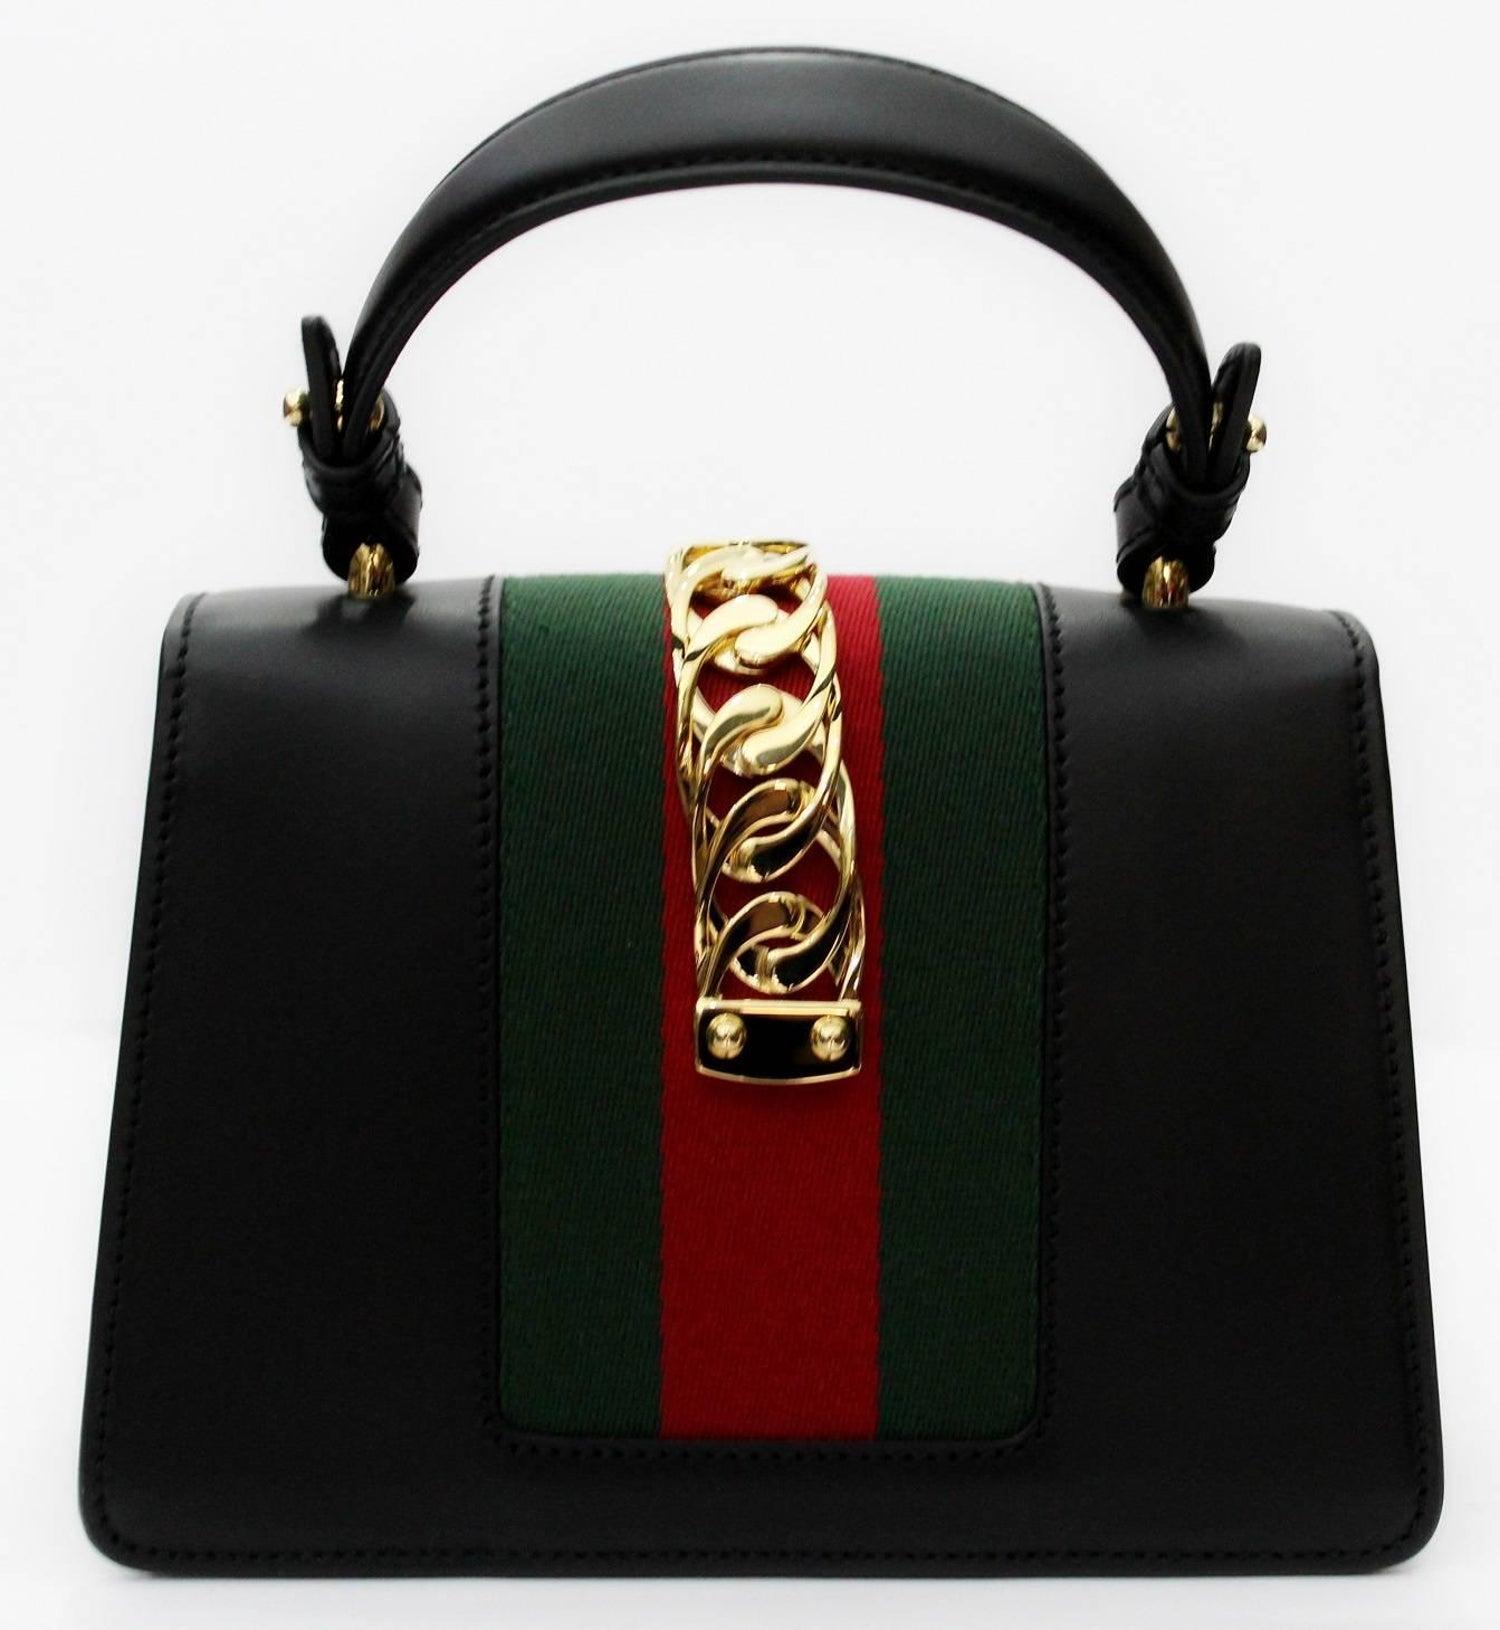 78593c35010126 Gucci Mini Black Sylvie Bag 2018 For Sale at 1stdibs